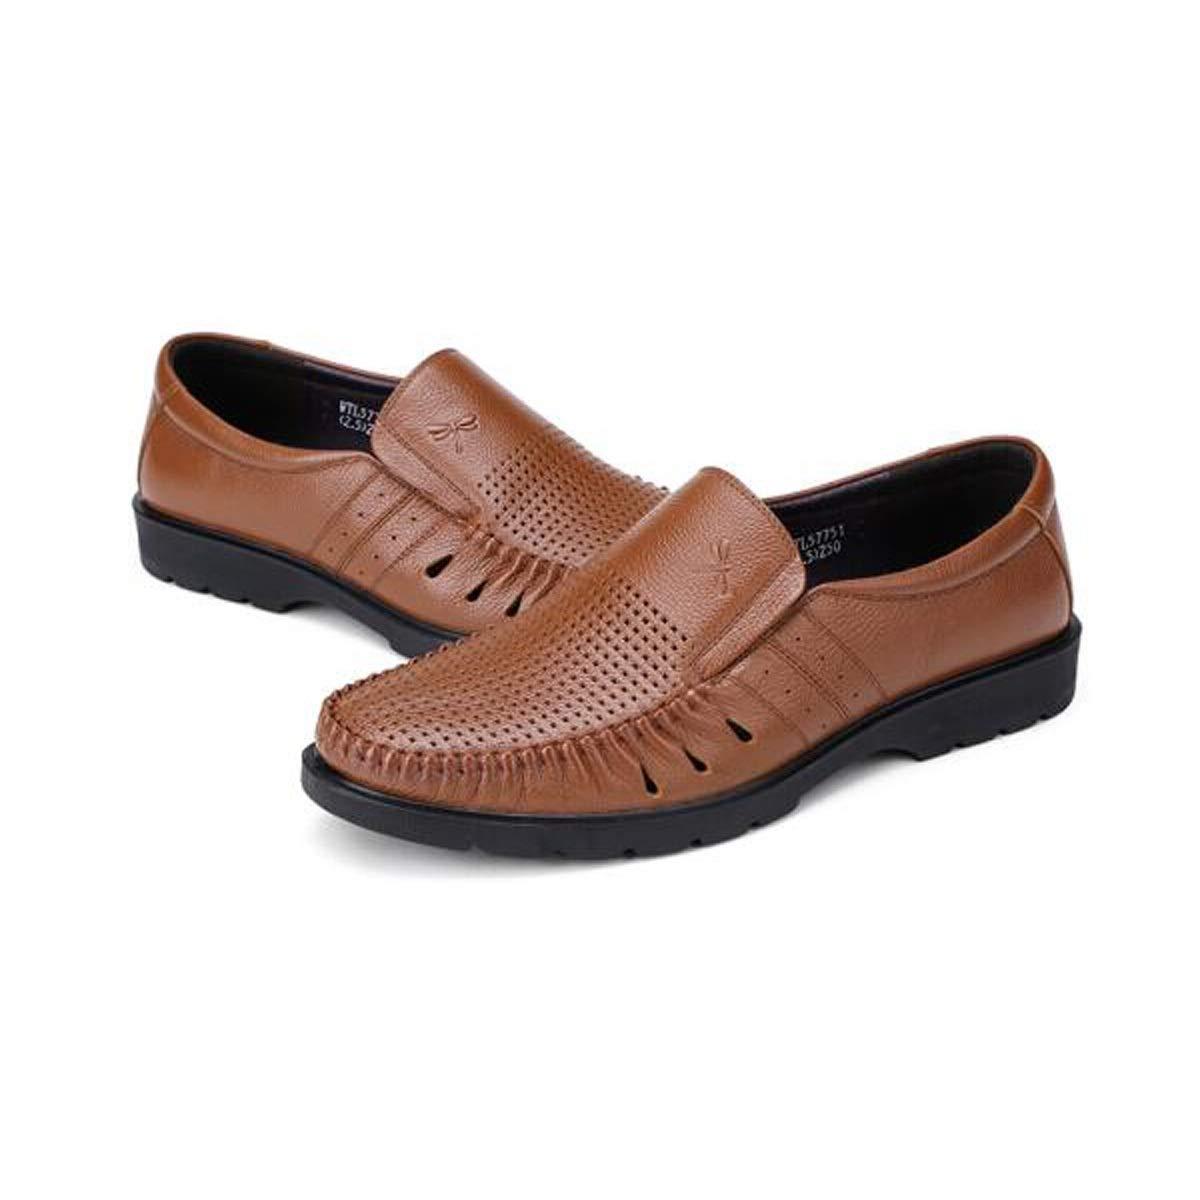 QINRUIKUANGSHAN Men's Shoes, Stylish and Comfortable, Men's Shoes, Sandals, Hole Shoes, Black and Brown Sports, (Color : Brown, Size : 39EU) by QINRUIKUANGSHAN